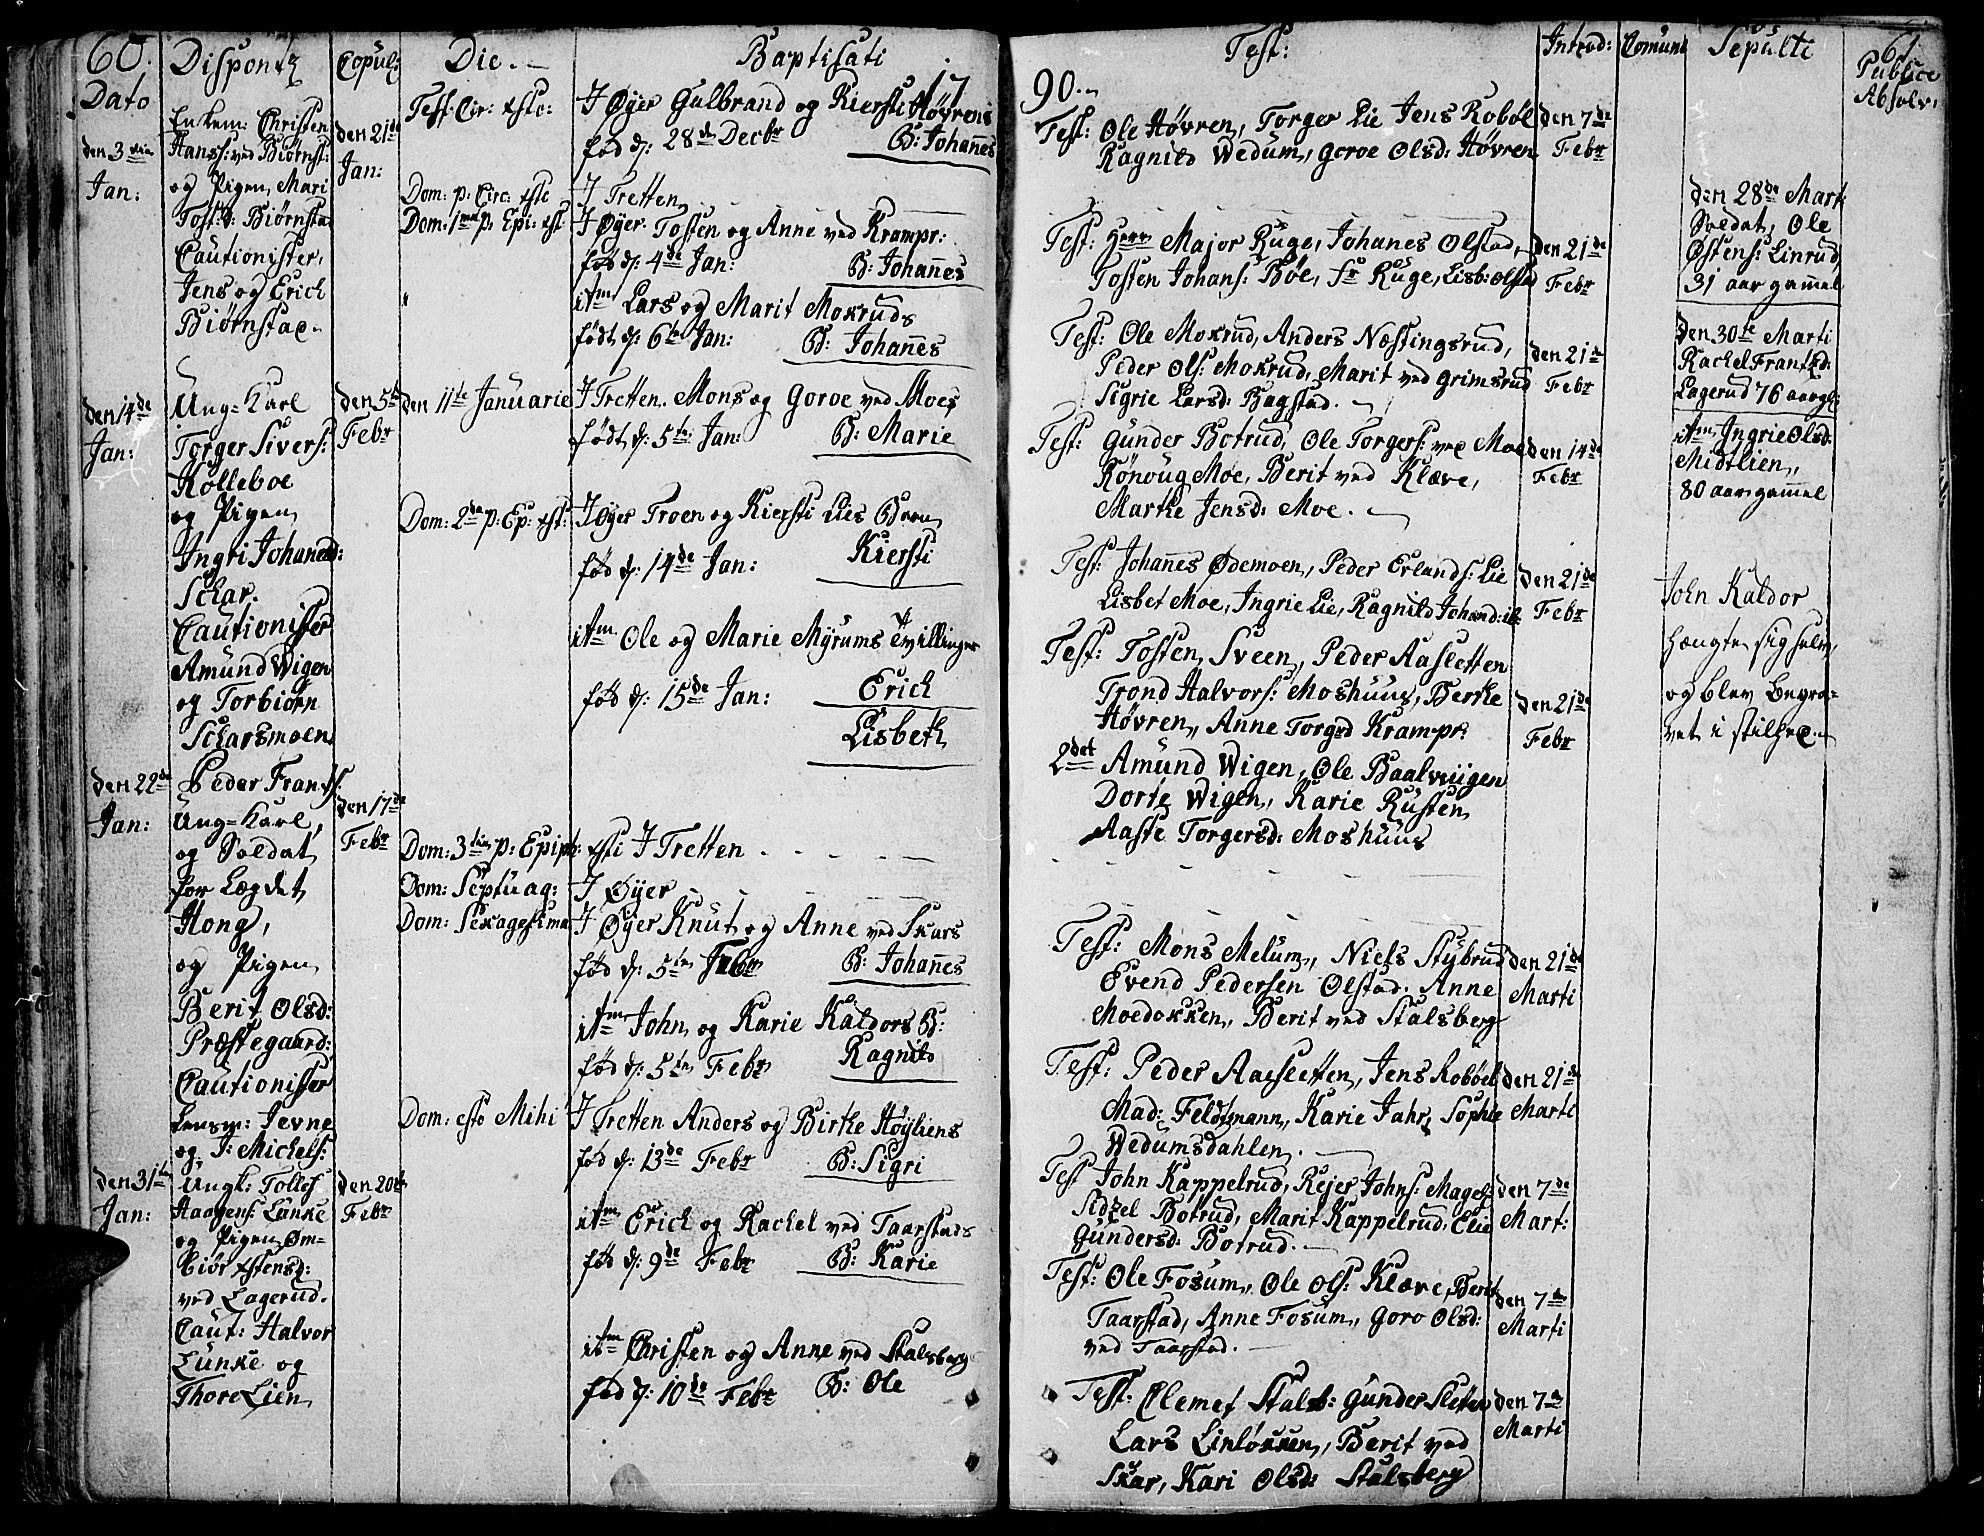 SAH, Øyer prestekontor, Ministerialbok nr. 3, 1784-1824, s. 60-61